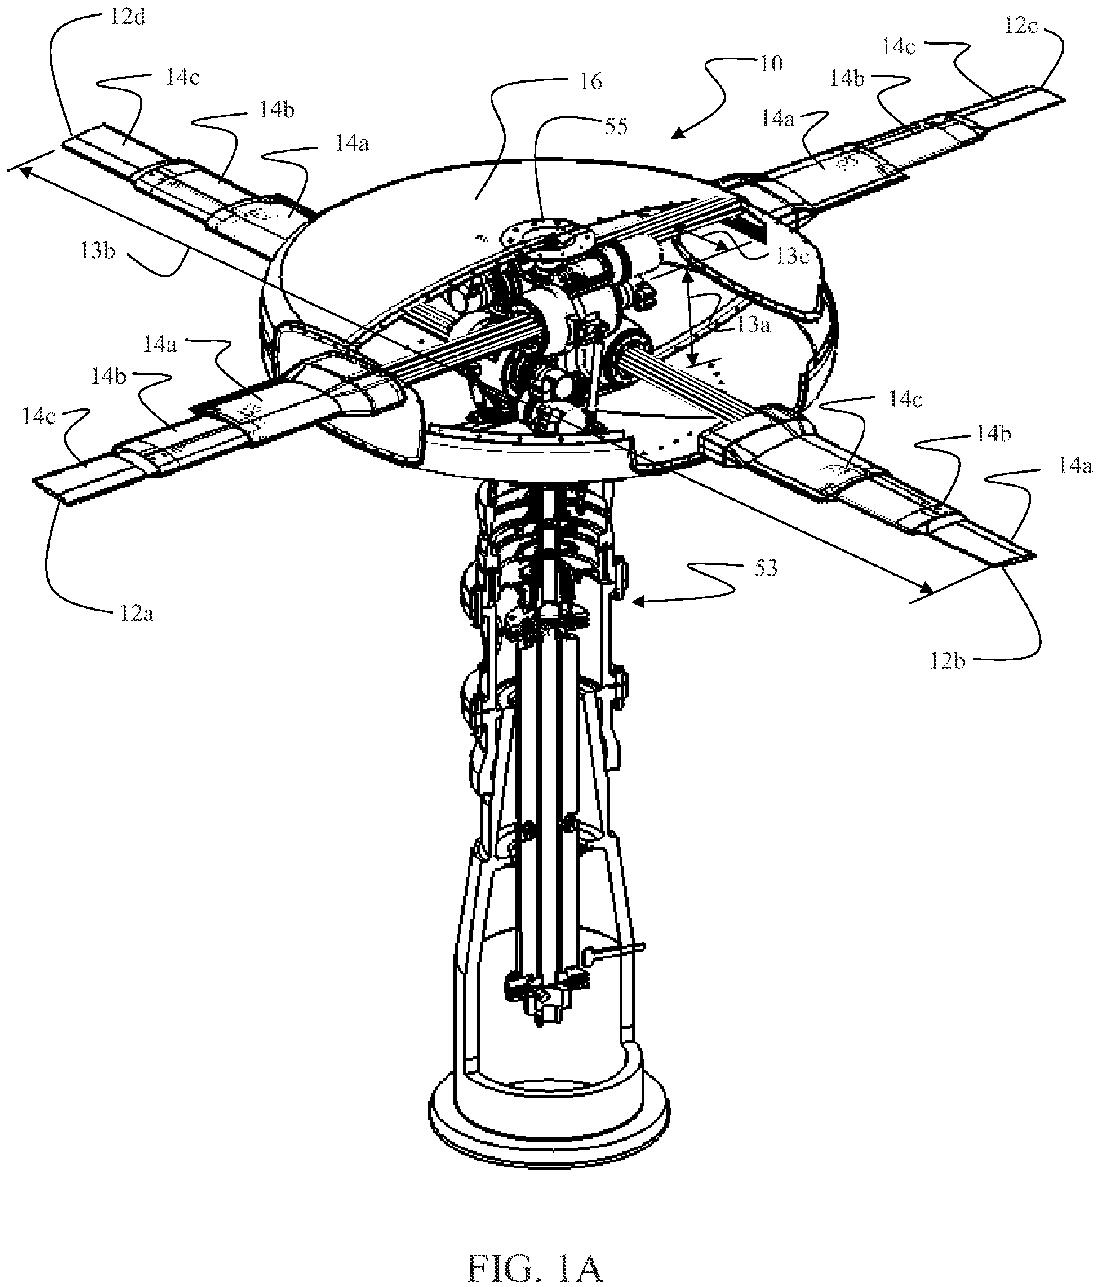 hight resolution of figure imgaf001